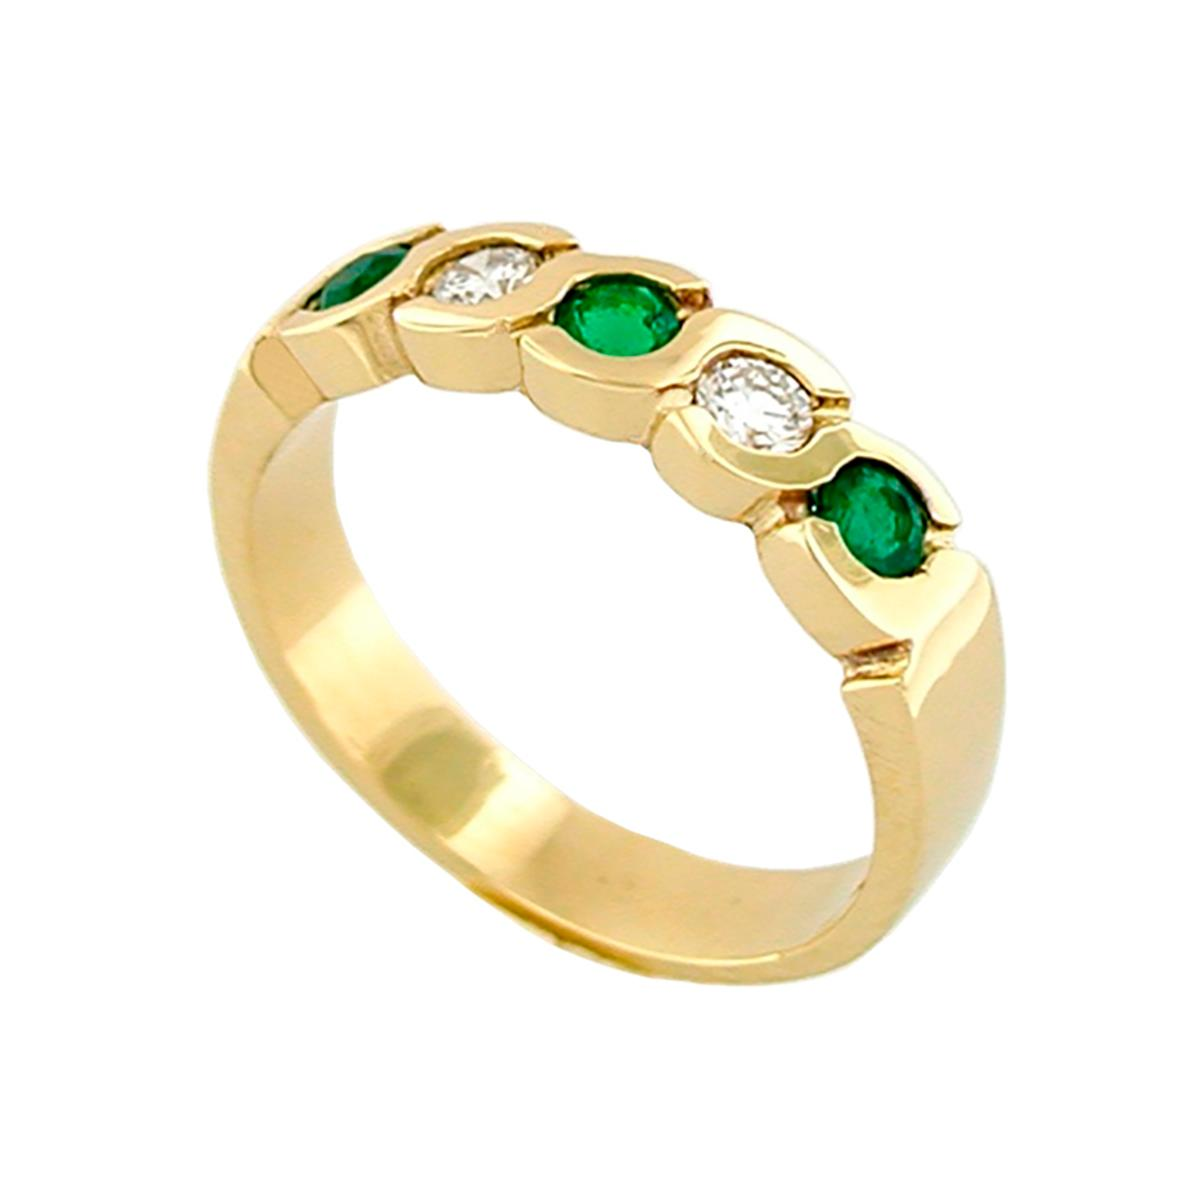 18k-gold-diamond-and-emerald-half-eternity-wedding-band-in-bezel-setting